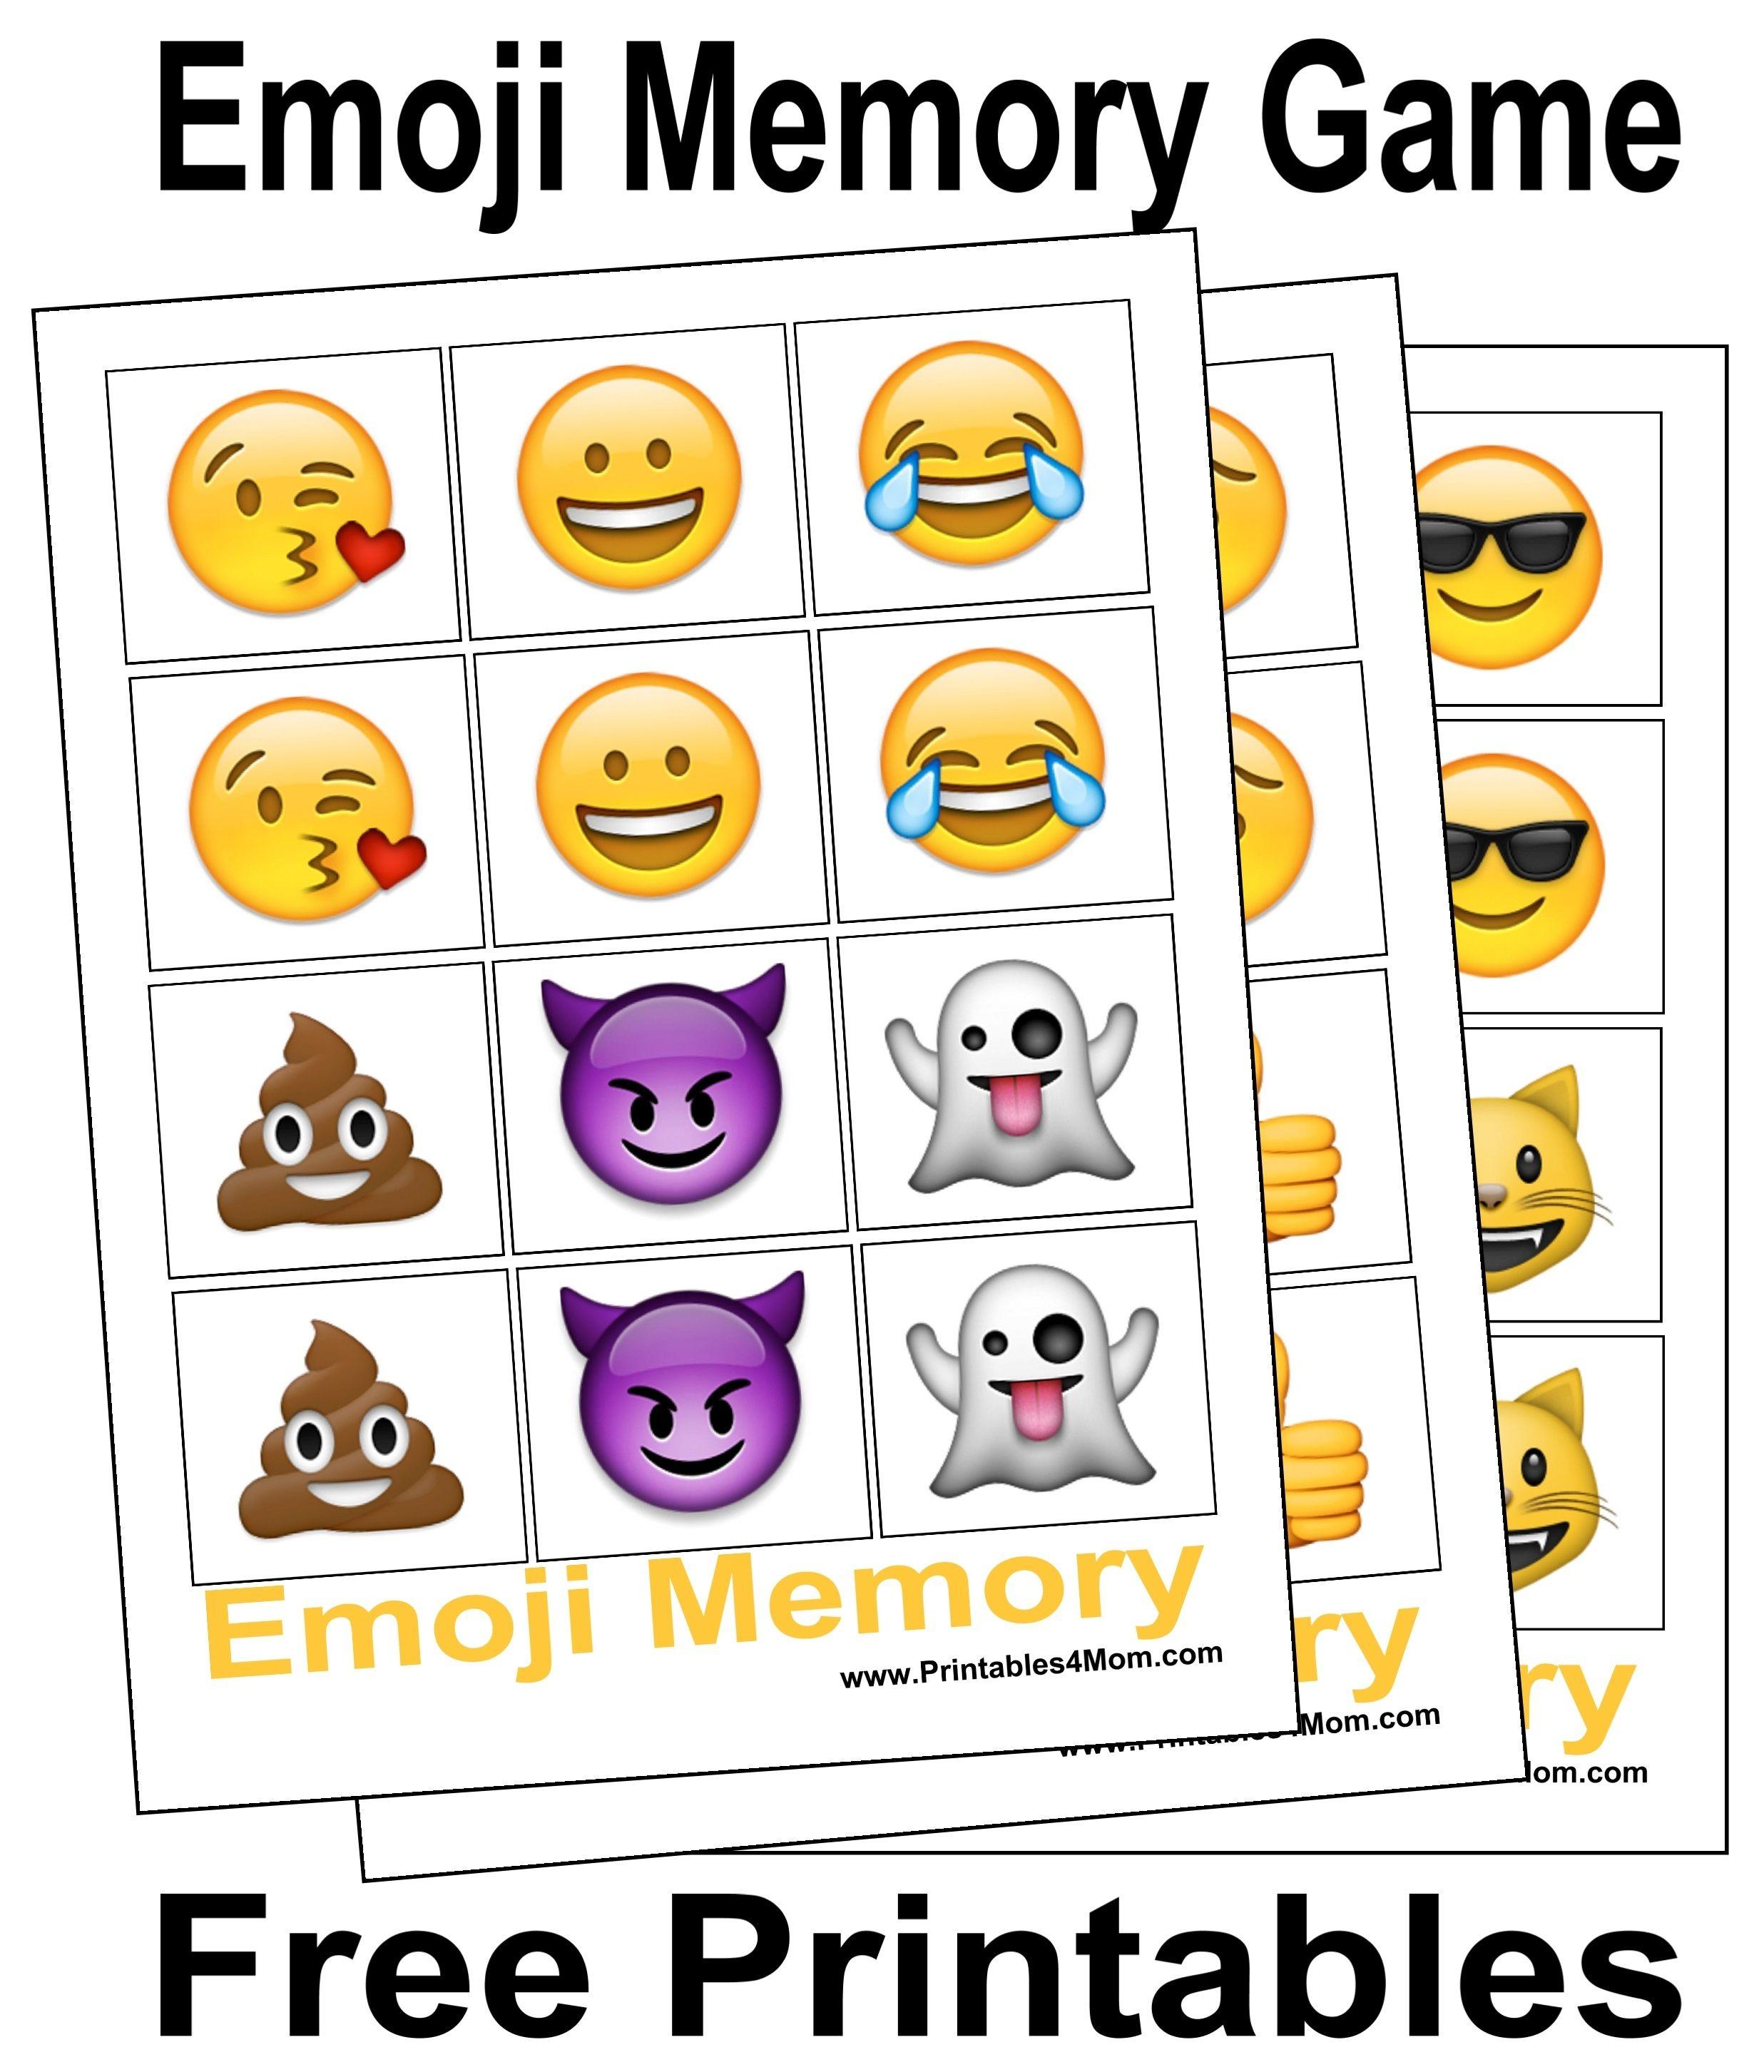 10 Free, Last Minute Printable Stocking Stuffer Games   Emotions - Printable Emoji Puzzles